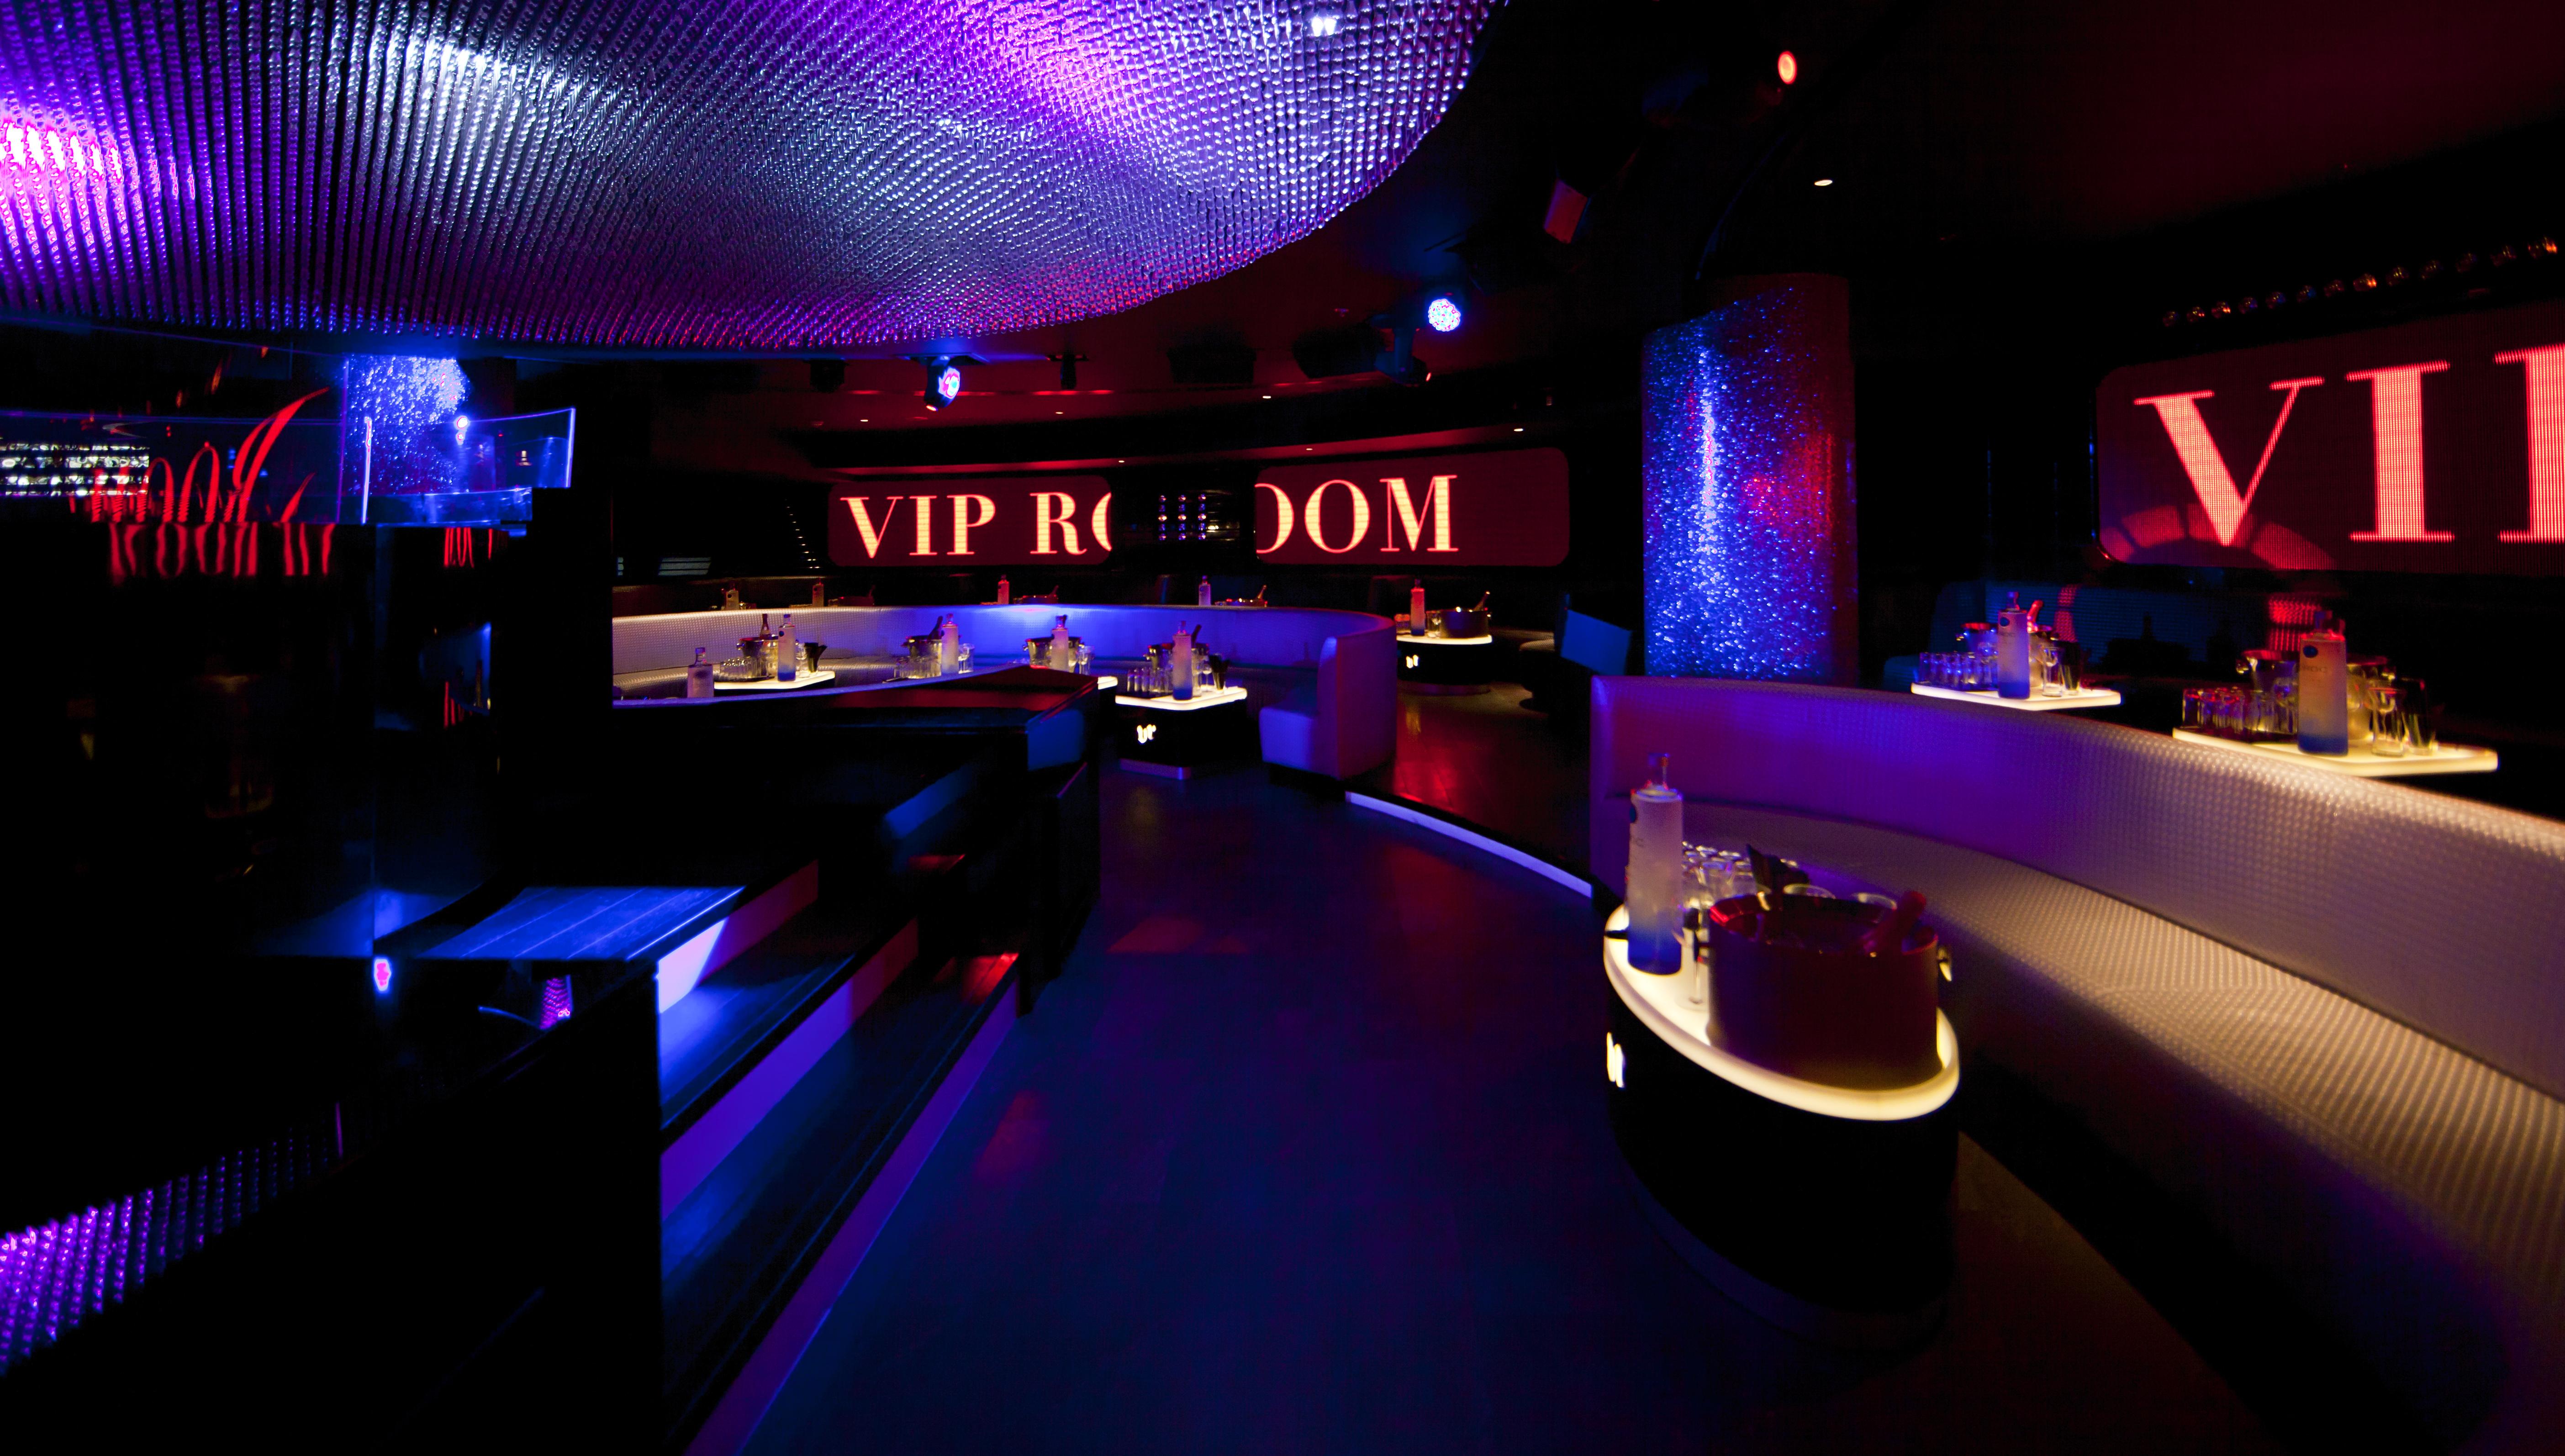 VIP ROOM 3